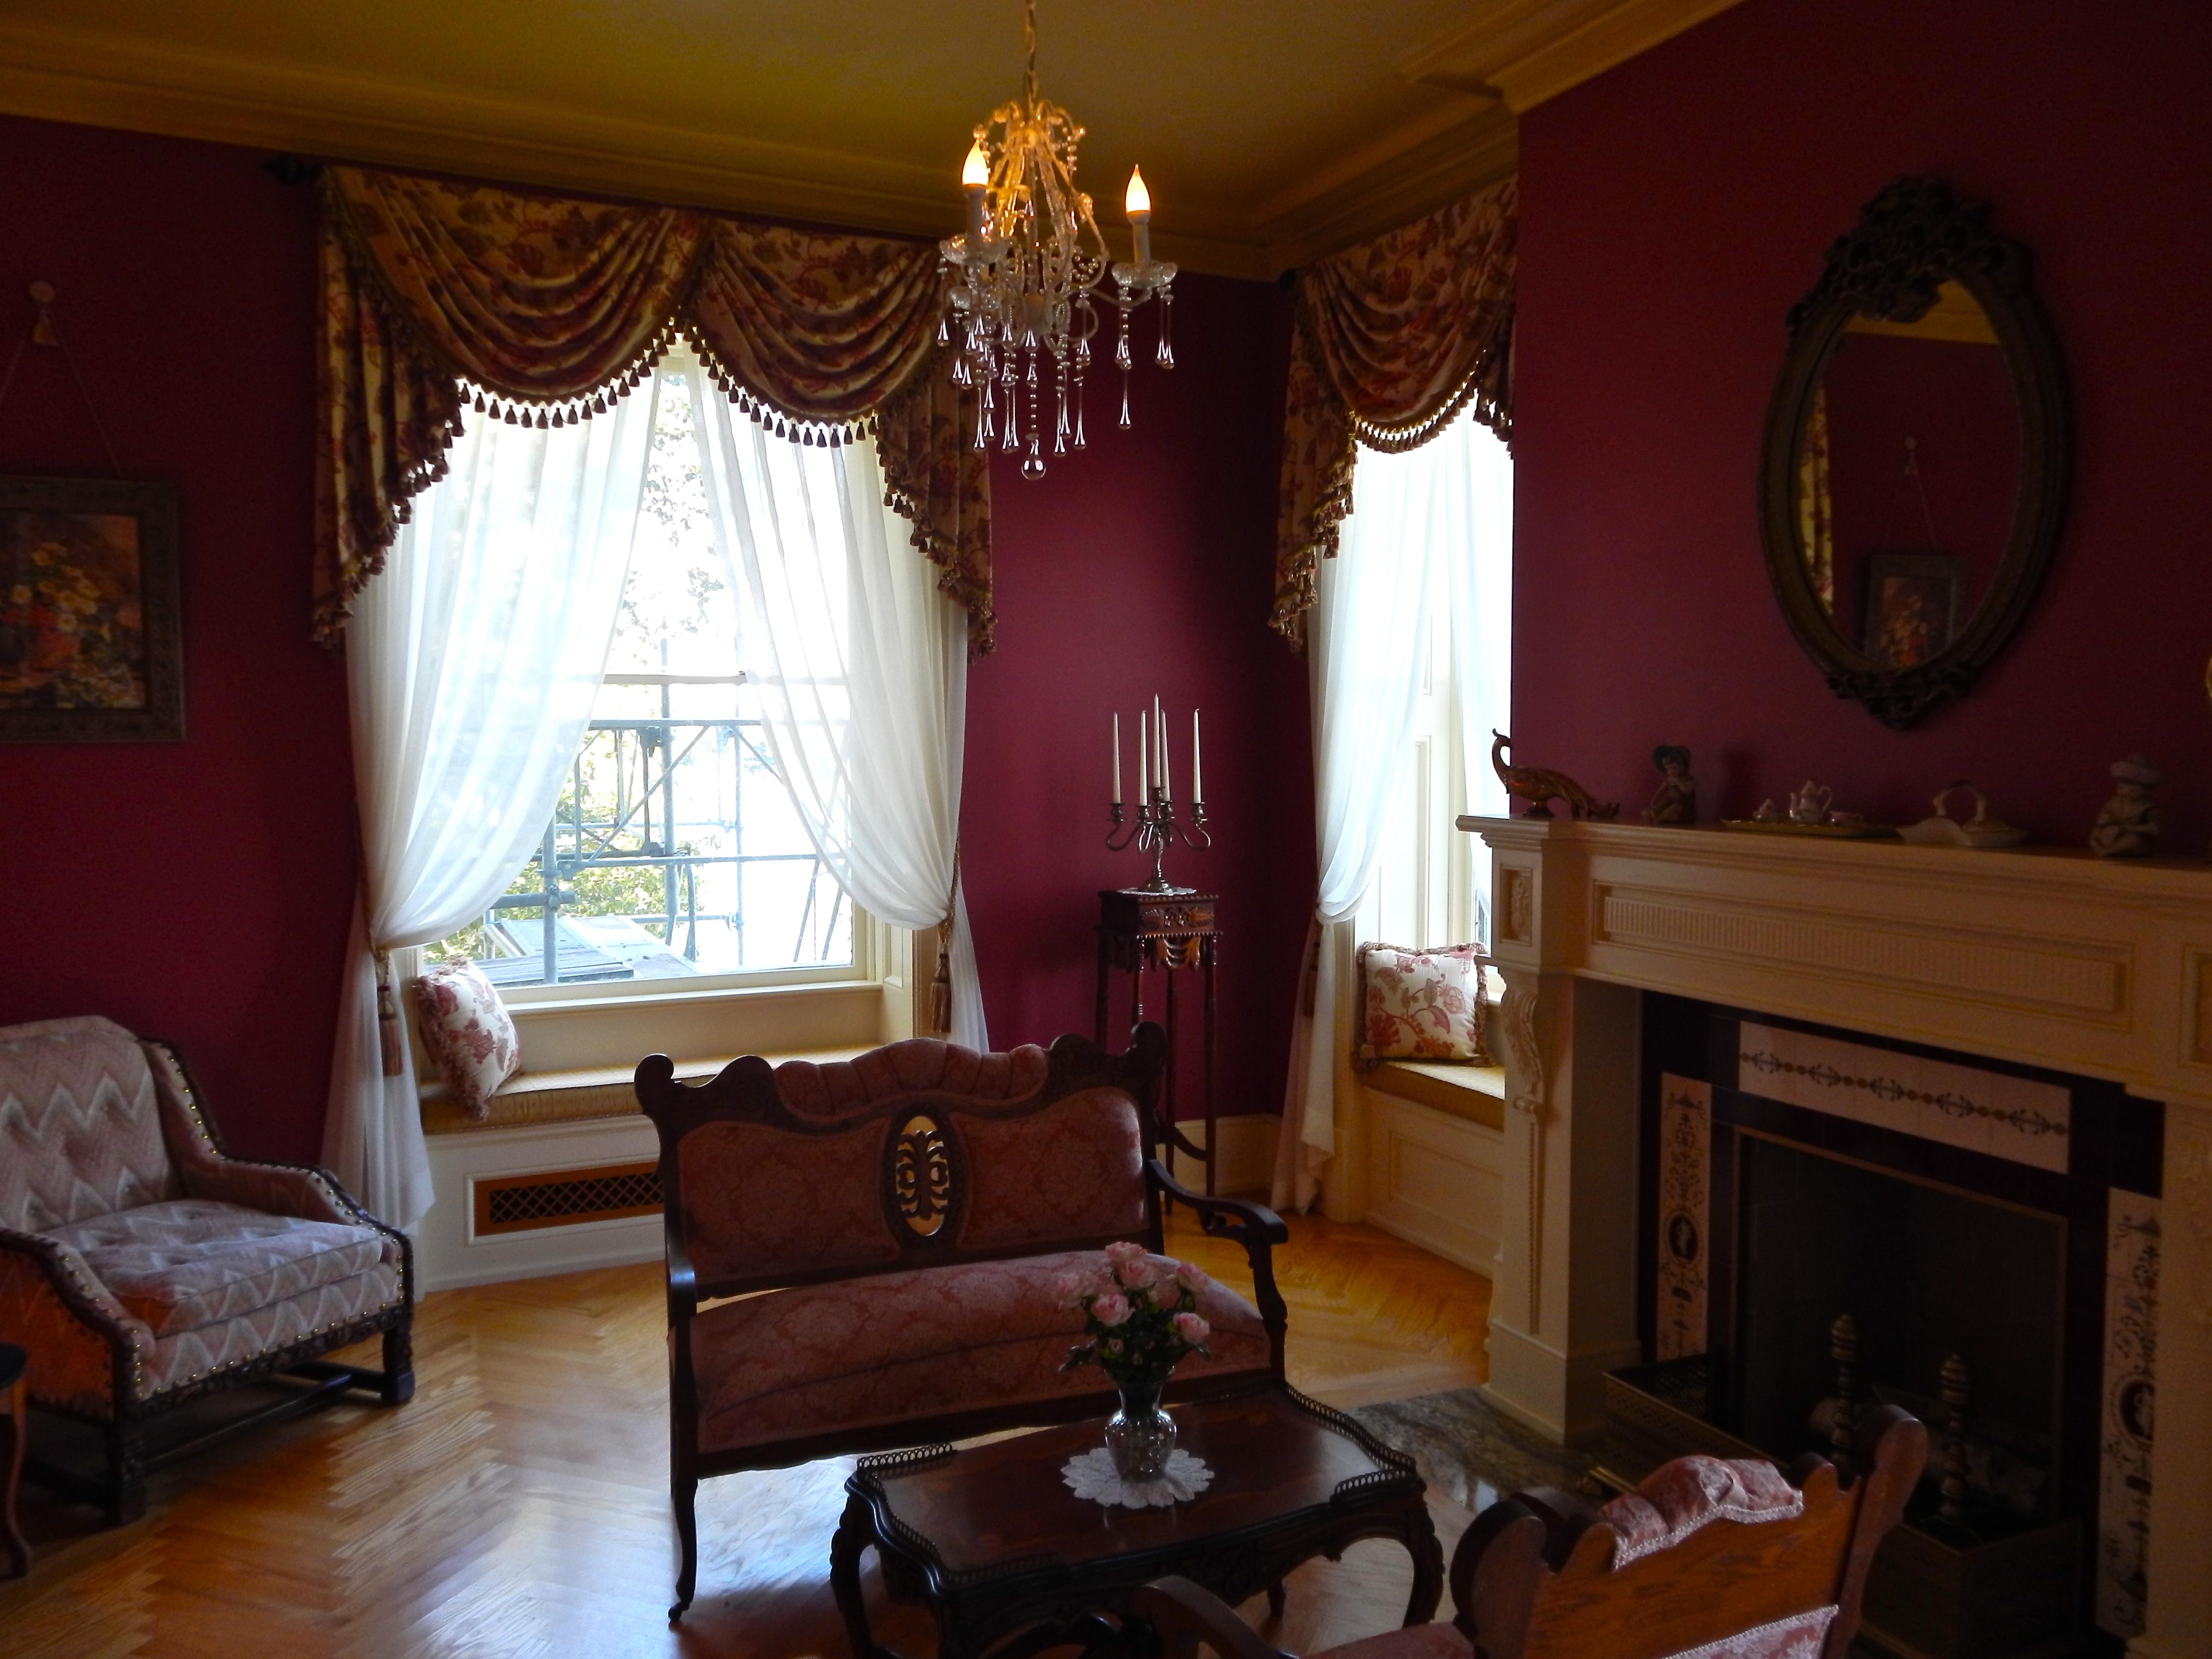 Boldt Castle Bonus Finished Interior Photos The Gilded